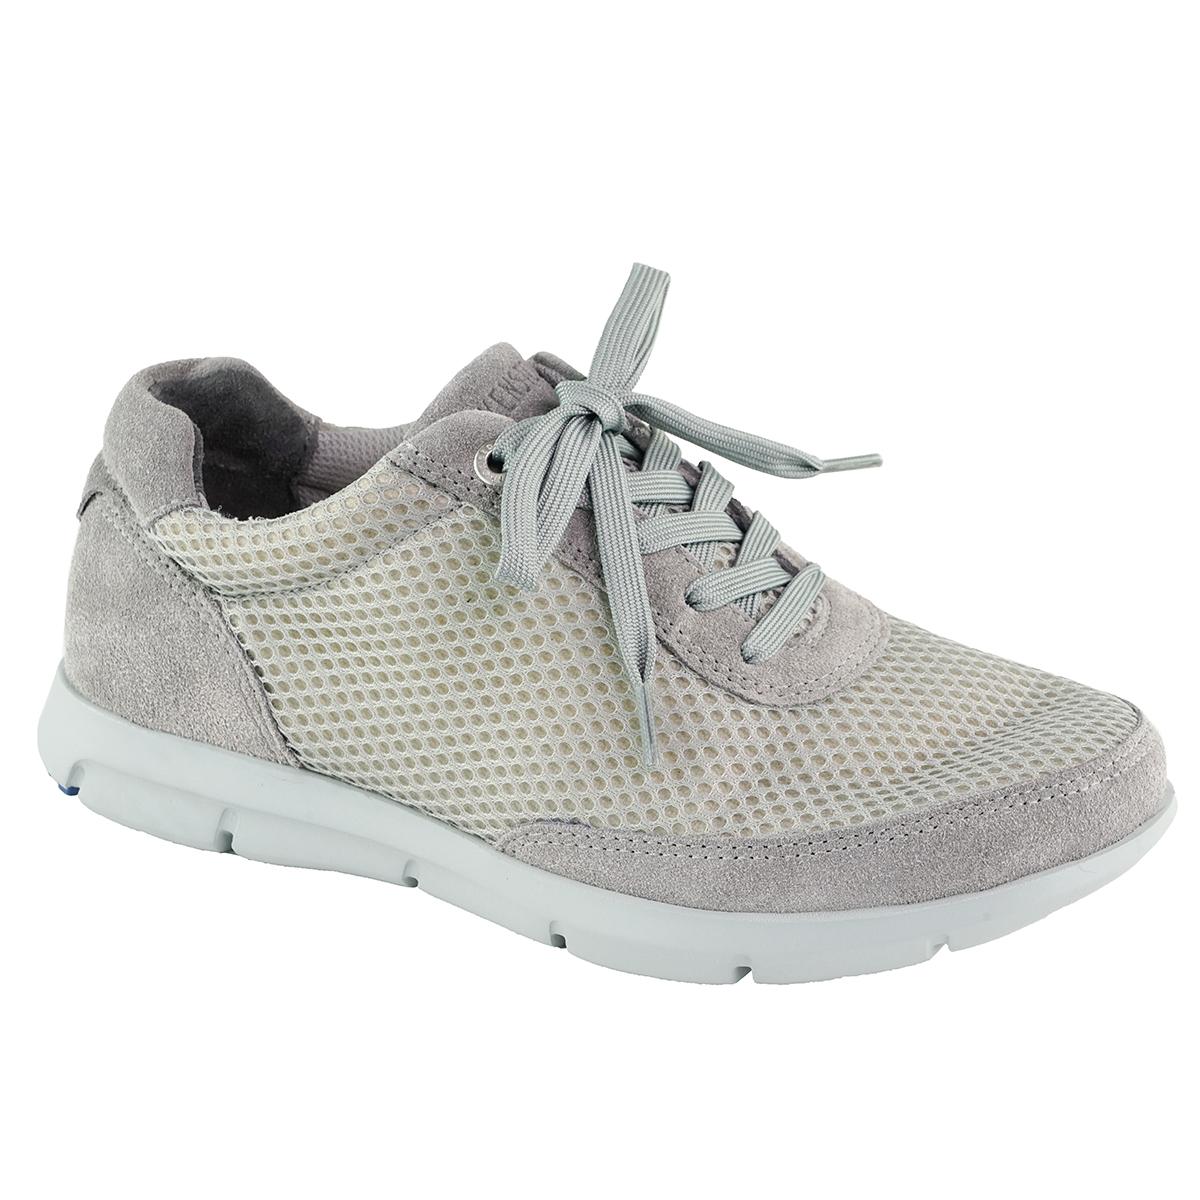 1874b9eb386e Birkenstock Women s Manitoba Suede Leather Textile Shoes Grey 37 ...